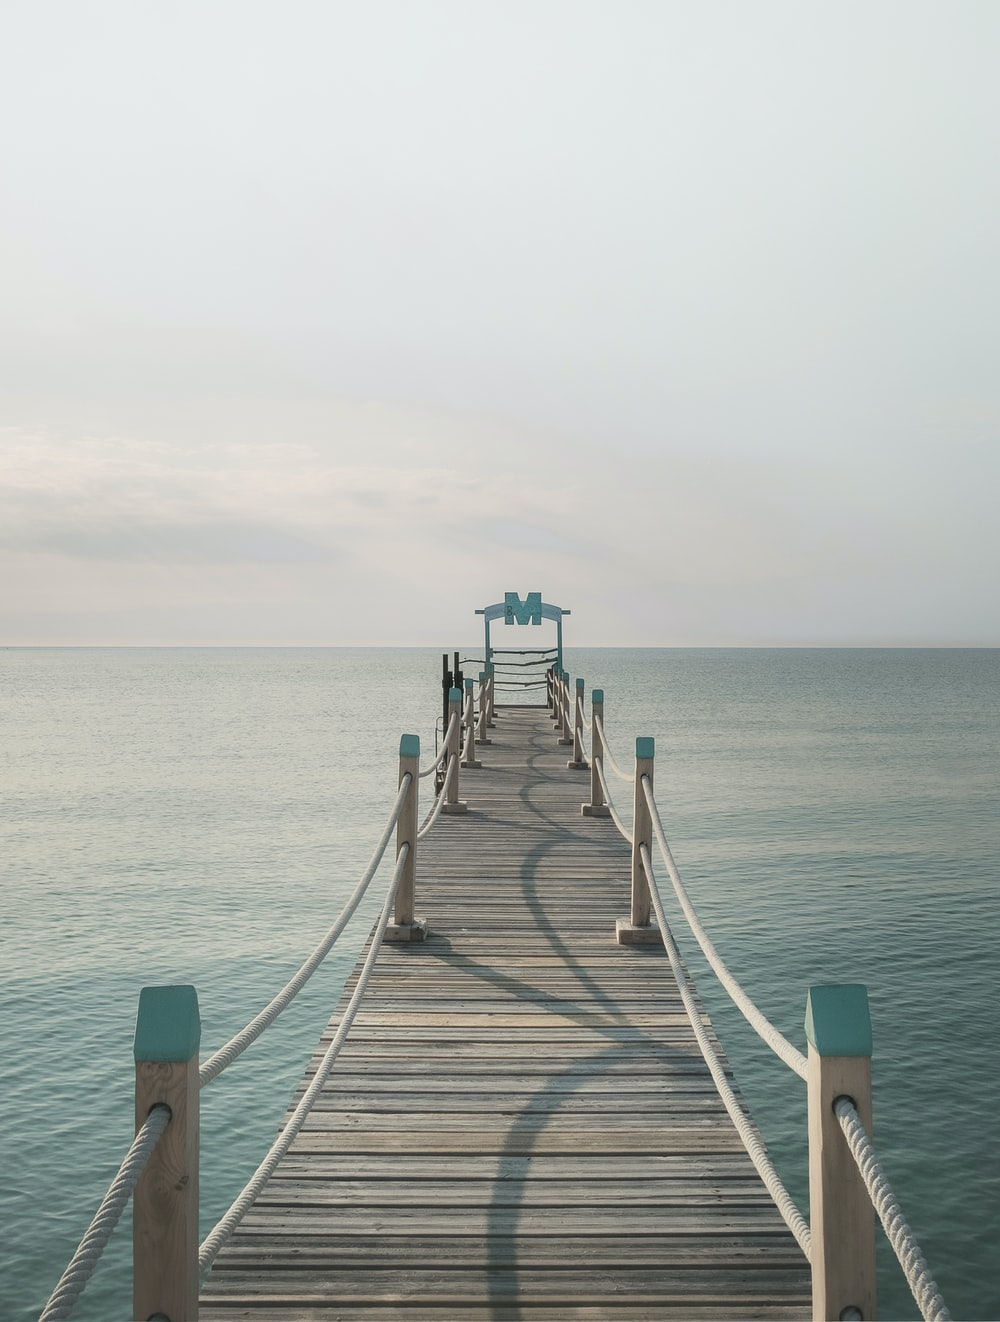 brown wooden pier near body of calm water